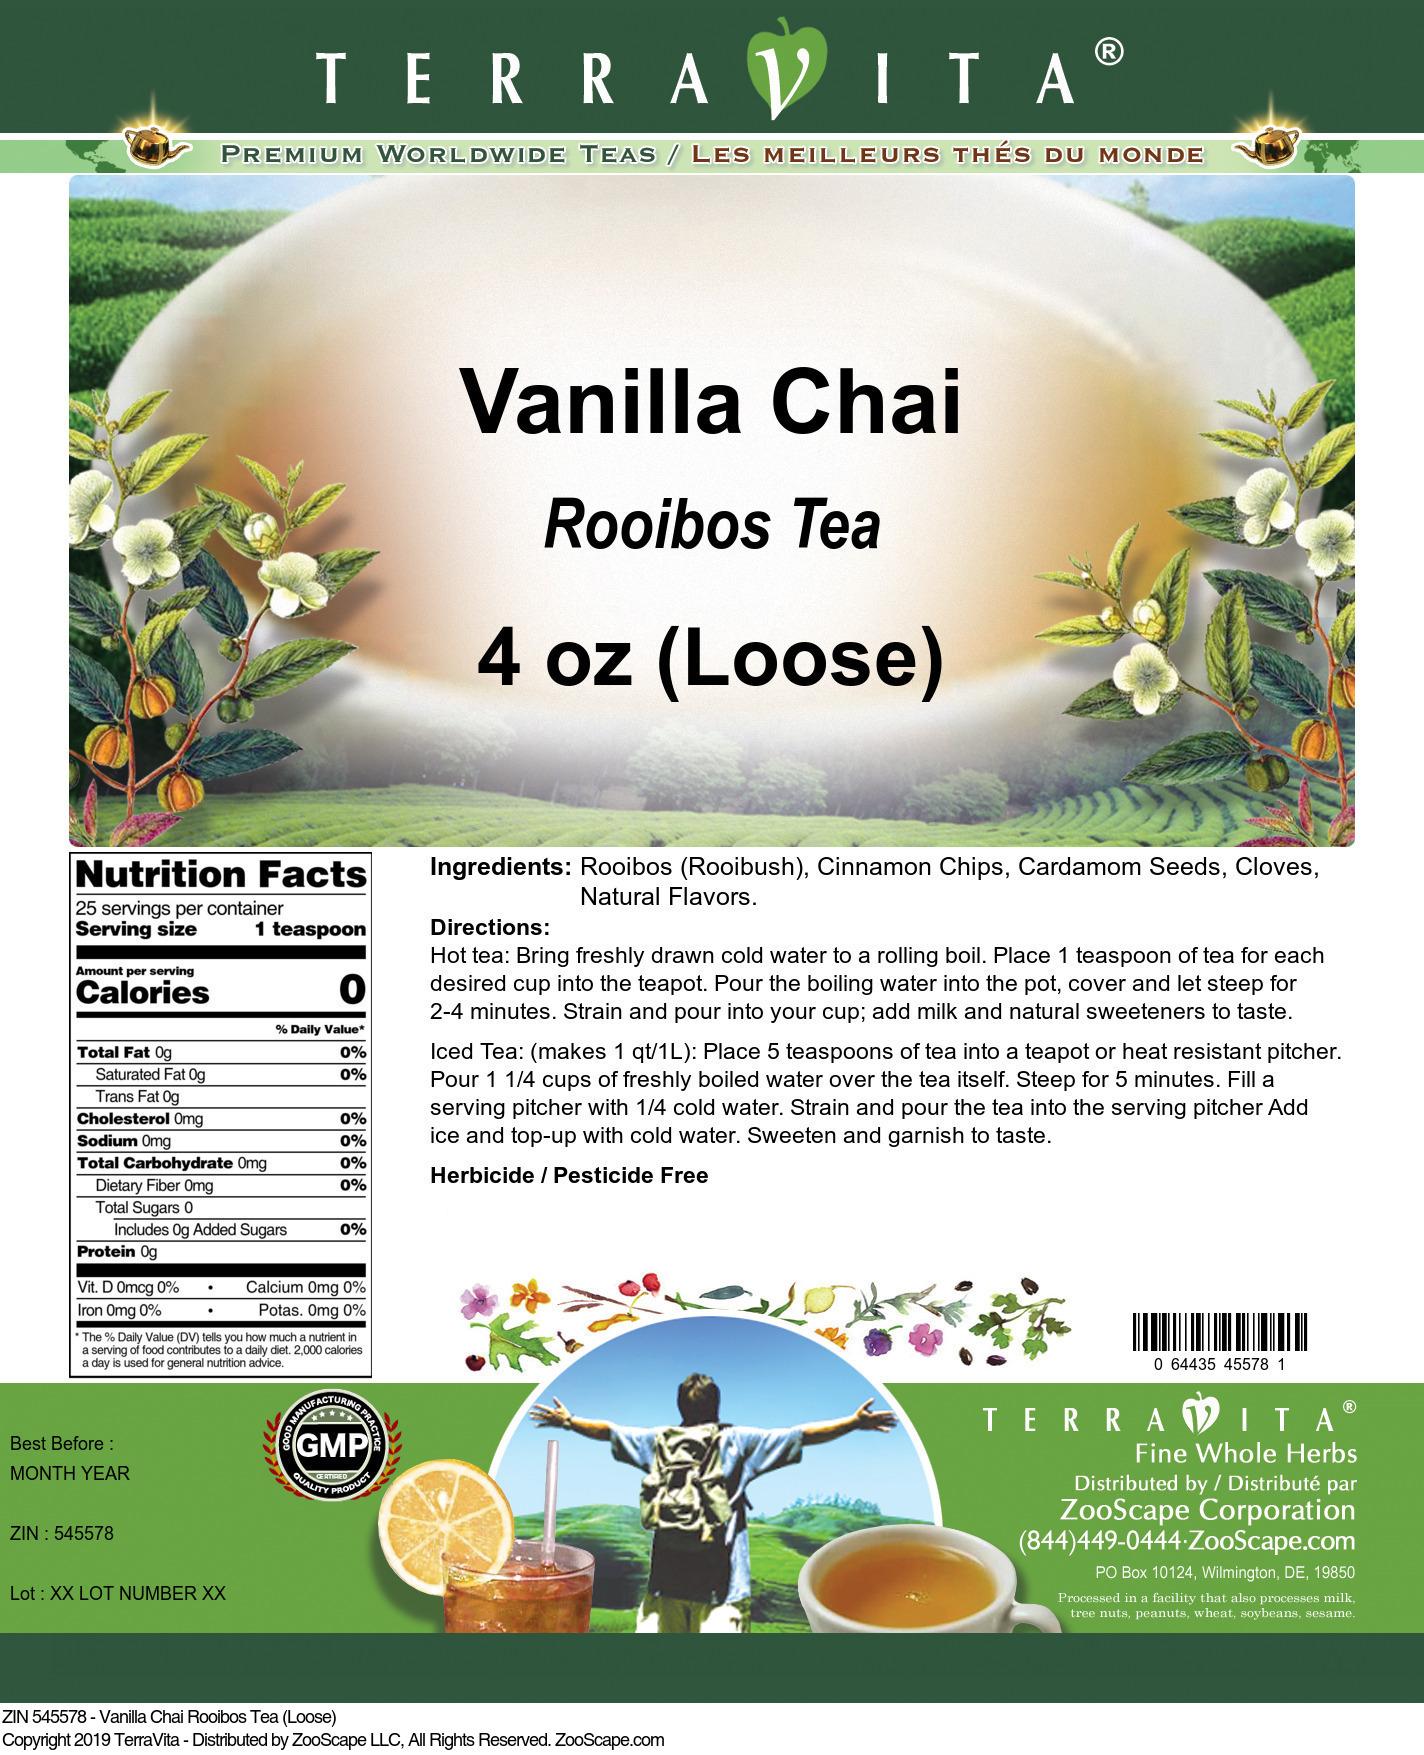 Vanilla Chai Rooibos Tea (Loose)